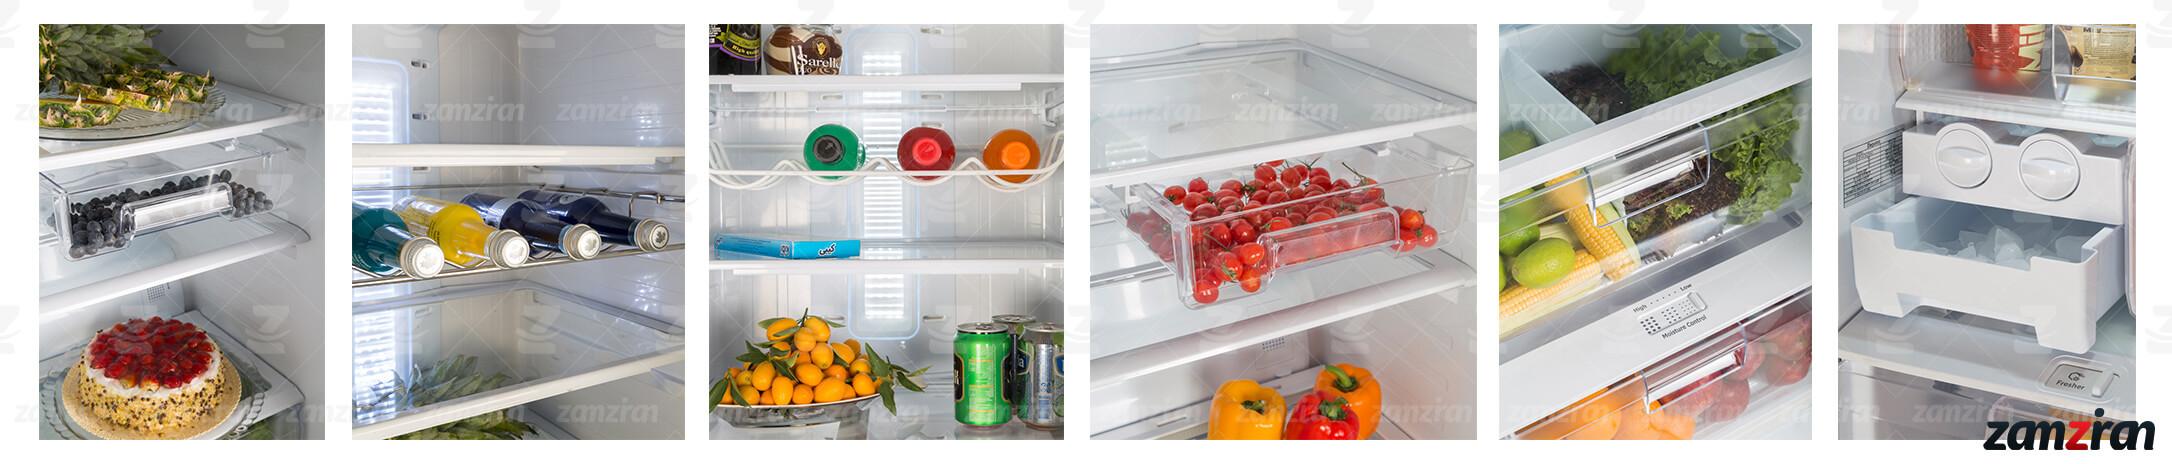 refrigerator depoint